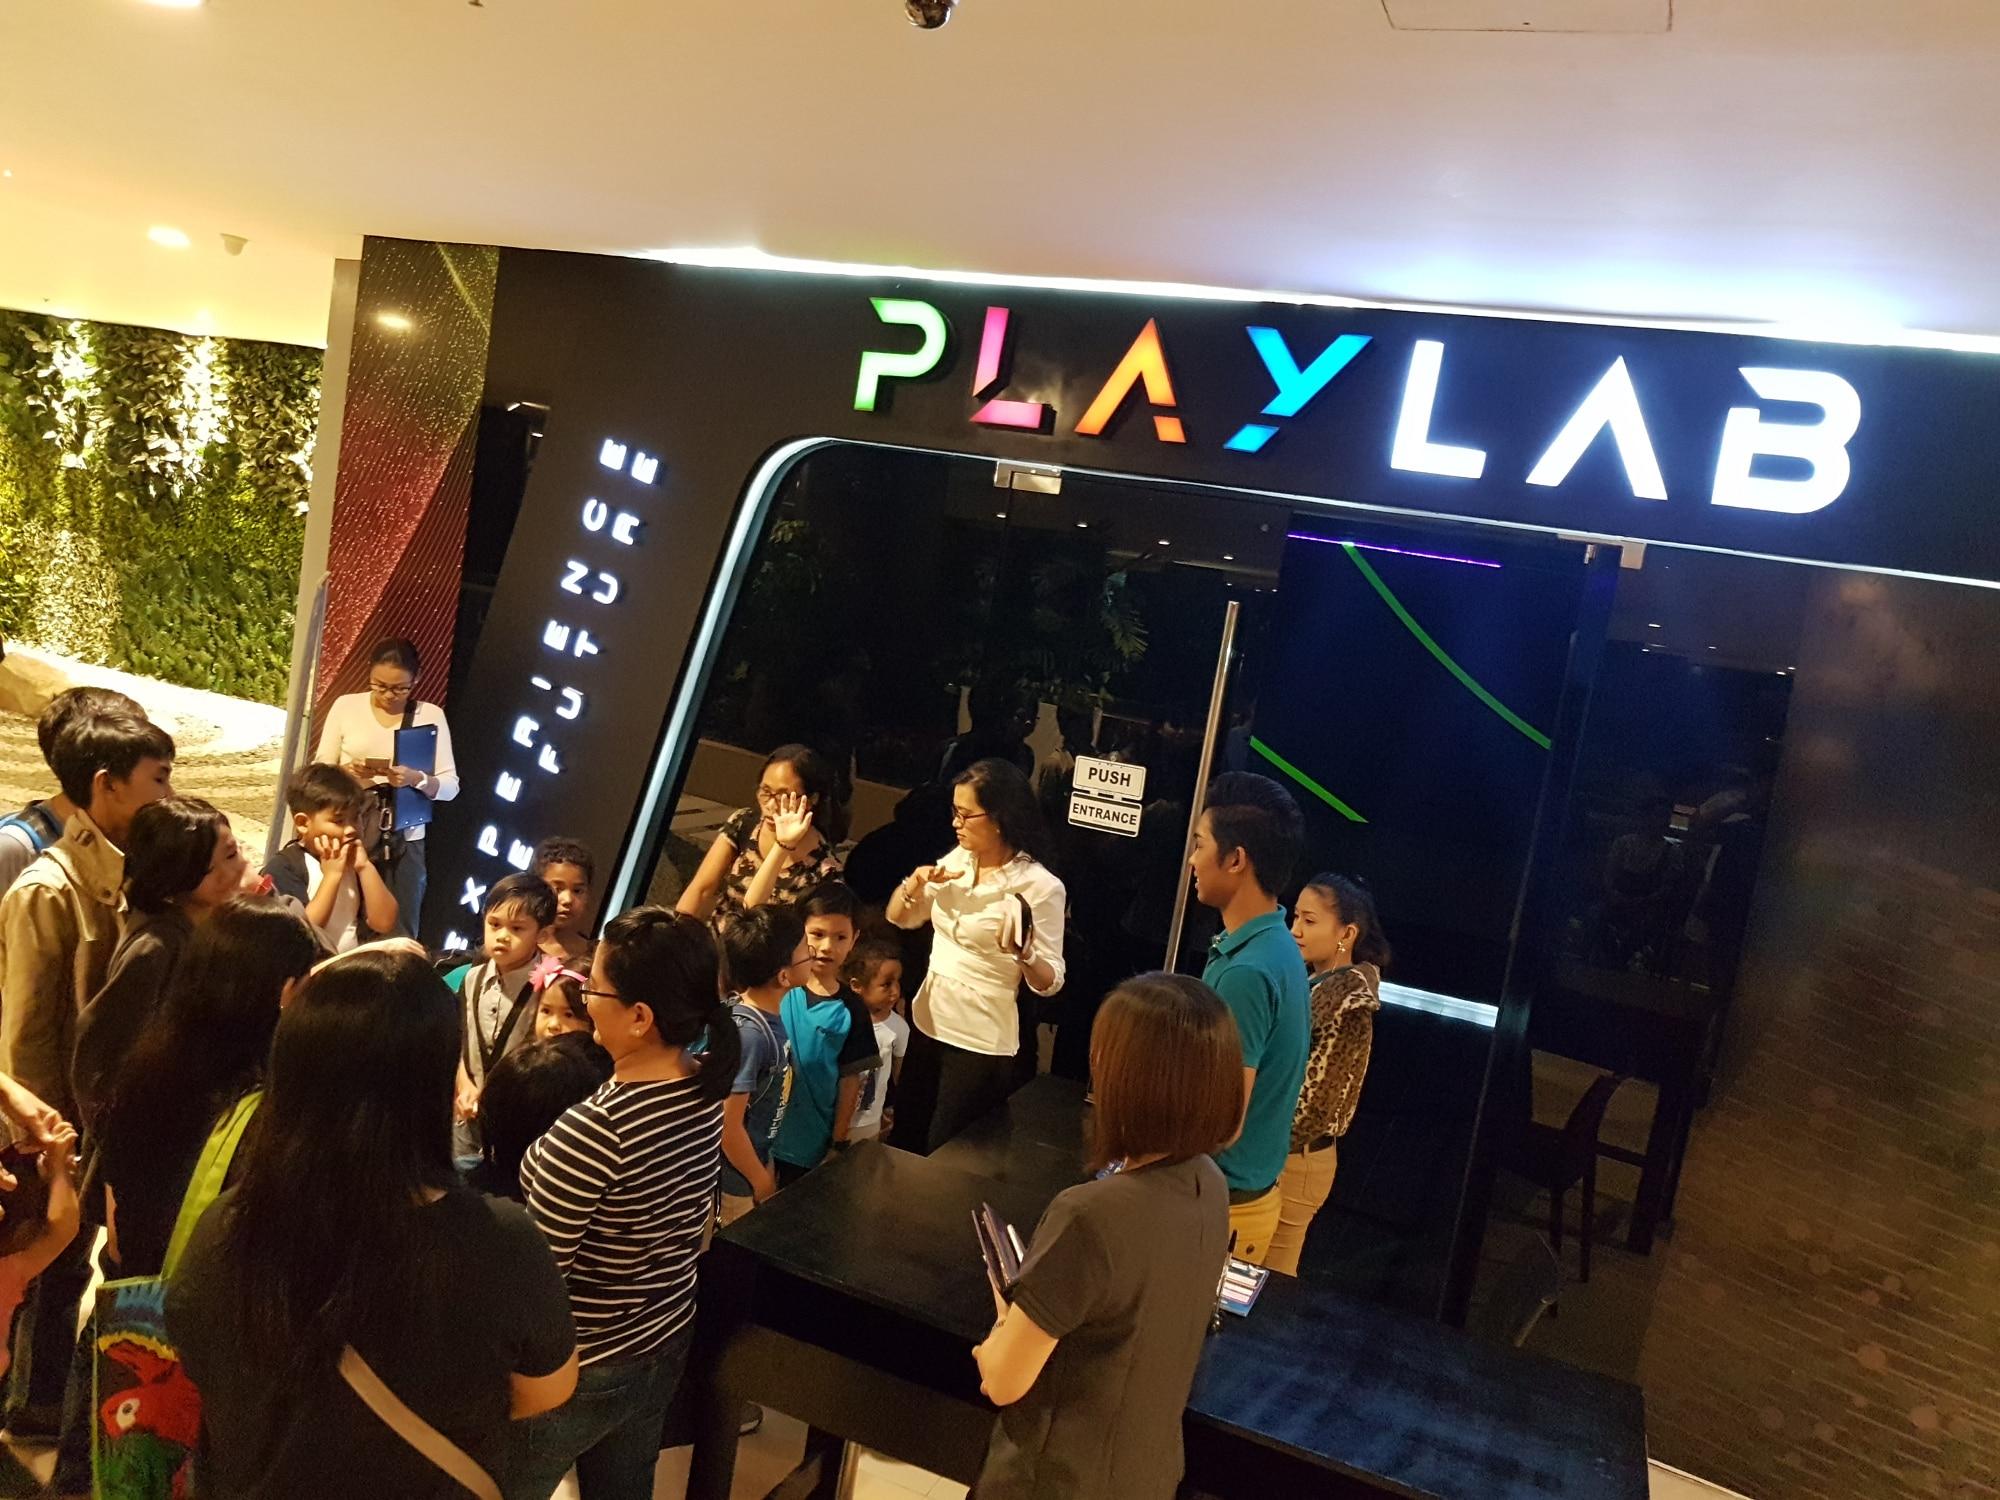 First Digital Playground In Ph Opens In Cebu Abs Cbn News